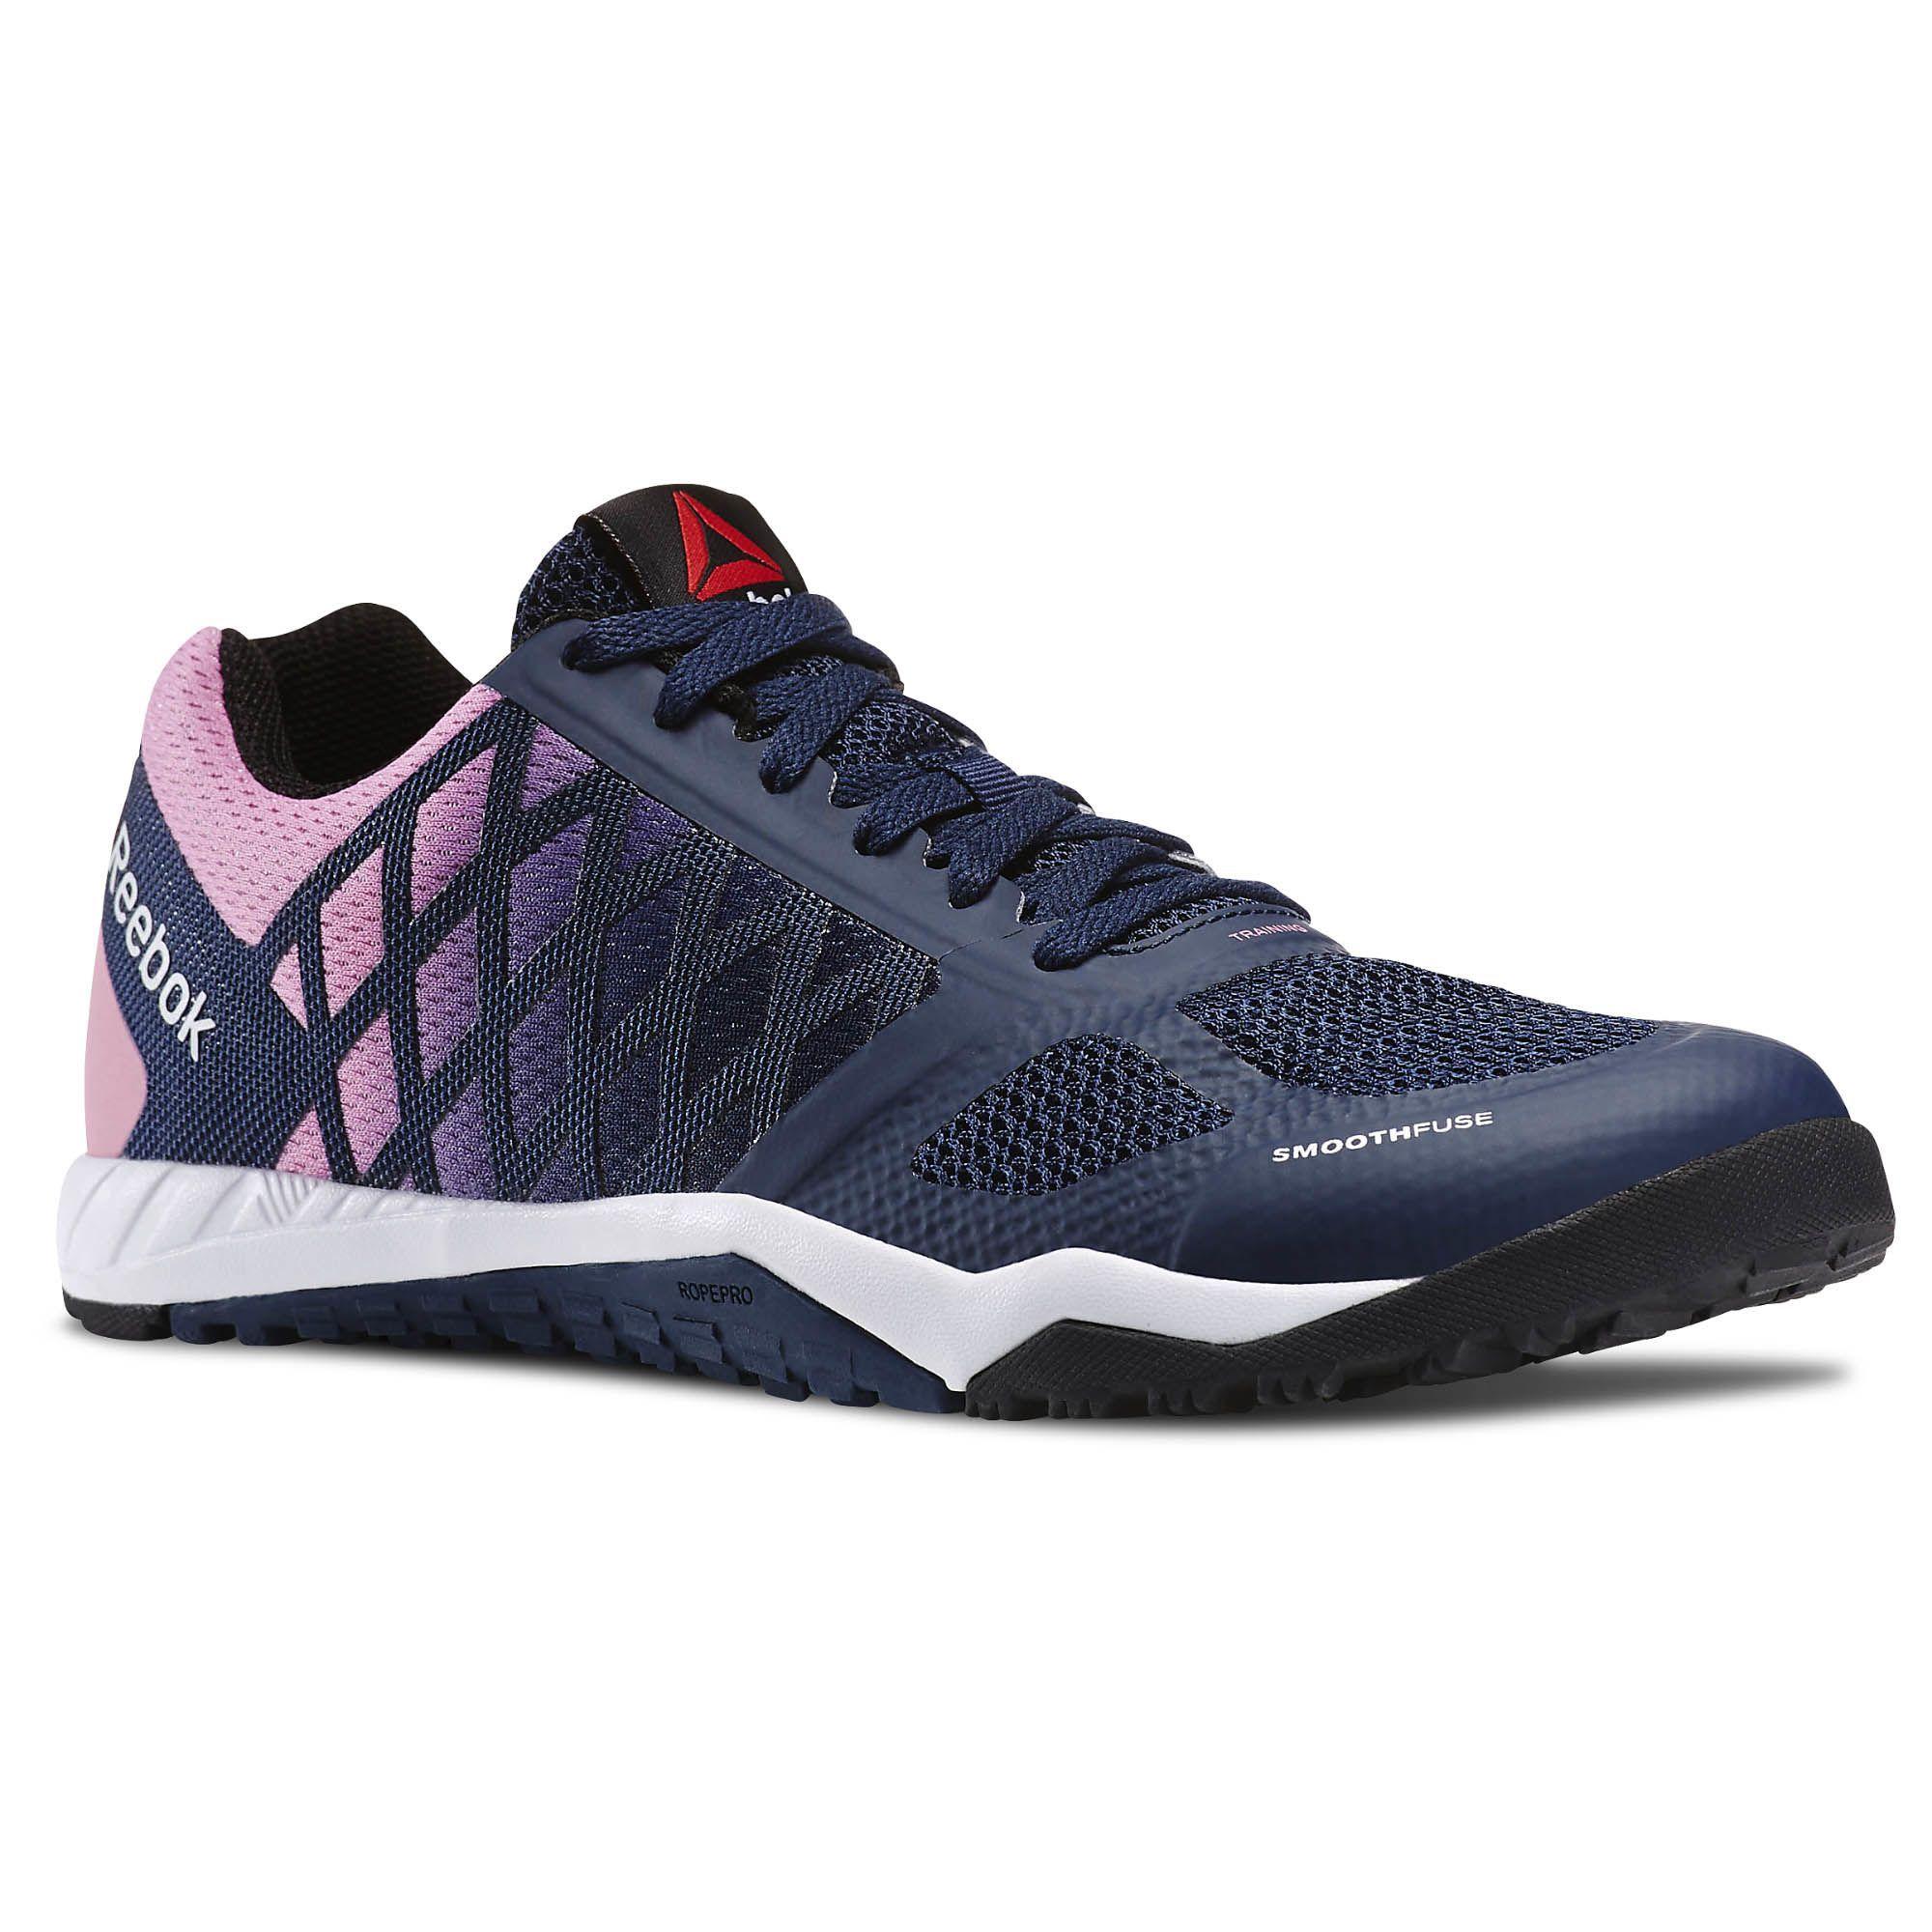 Reebok | Reebok, Sneakers, Shopping Pinterest